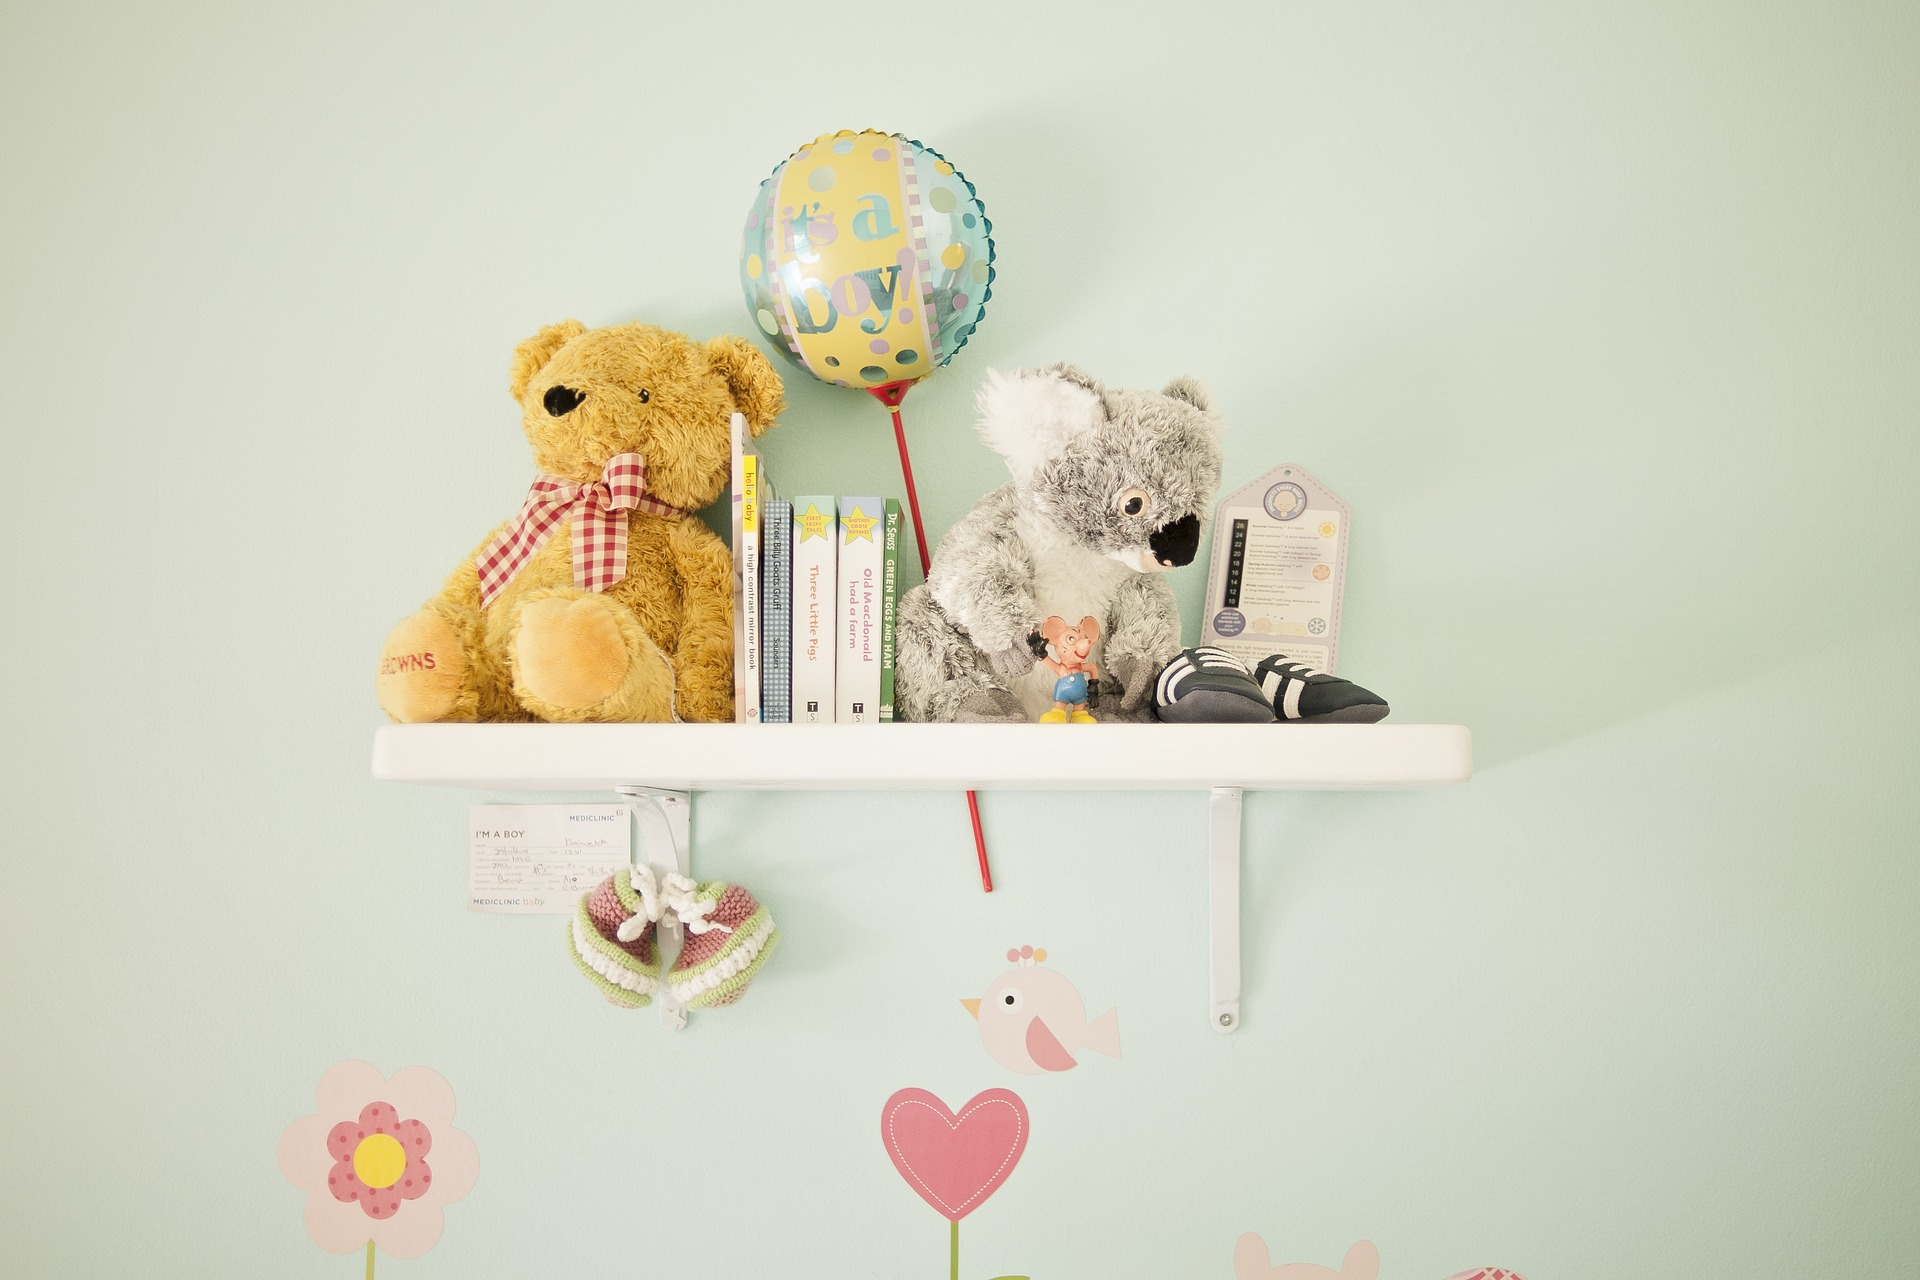 nursery-decoration-1963815_1920